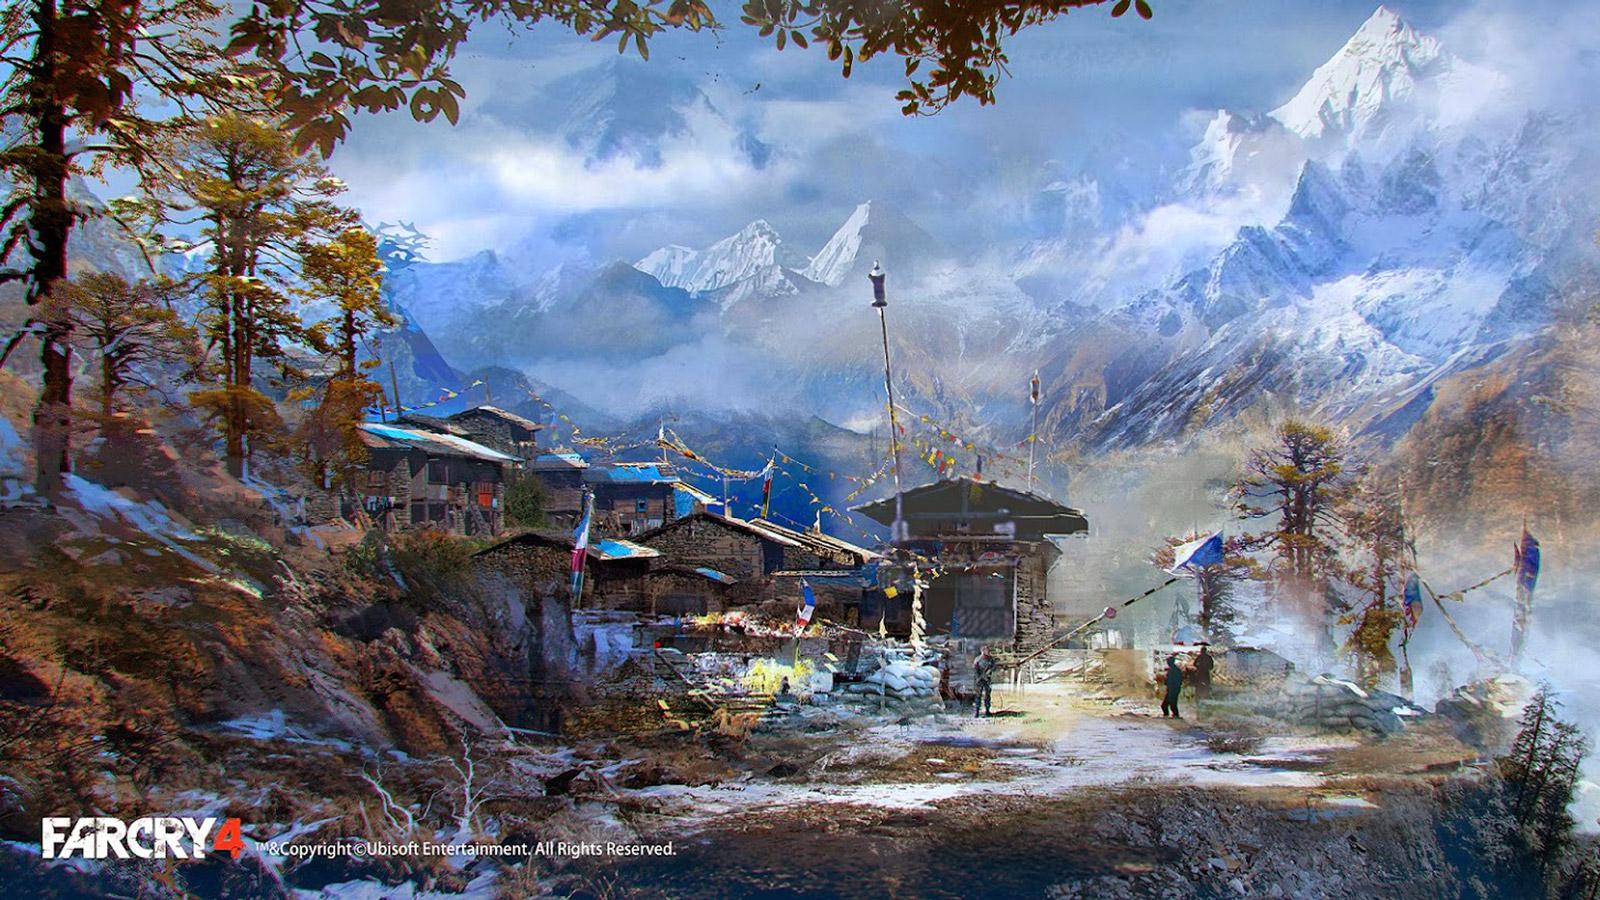 Far Cry 4 Wallpaper in 1600x900